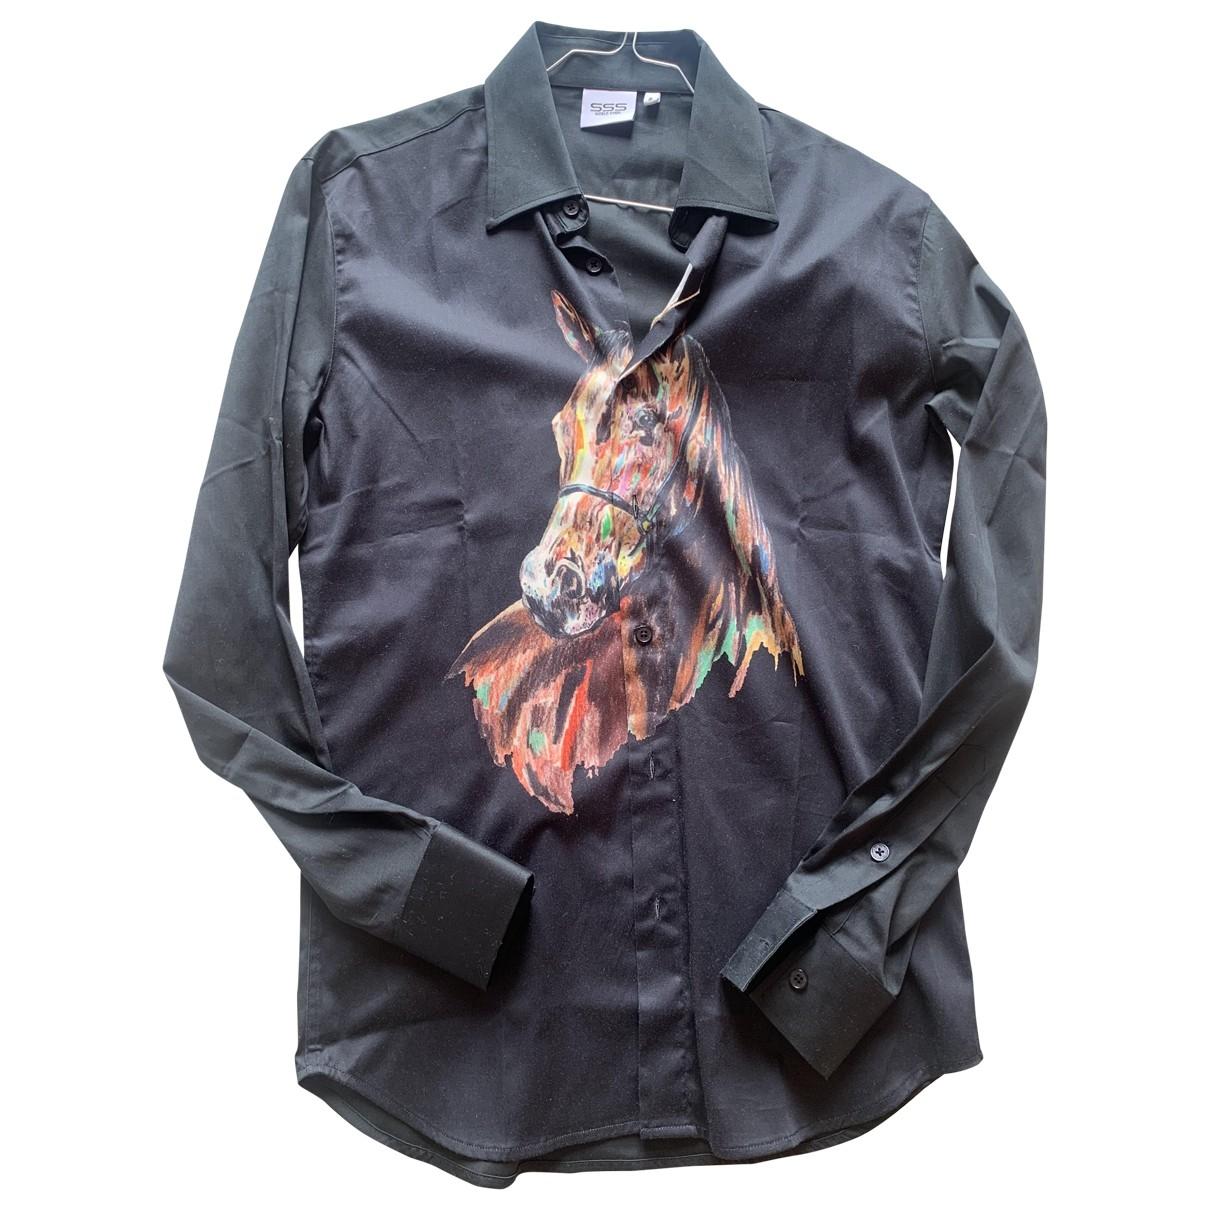 Sss World Corp \N Black Cotton Shirts for Men S International